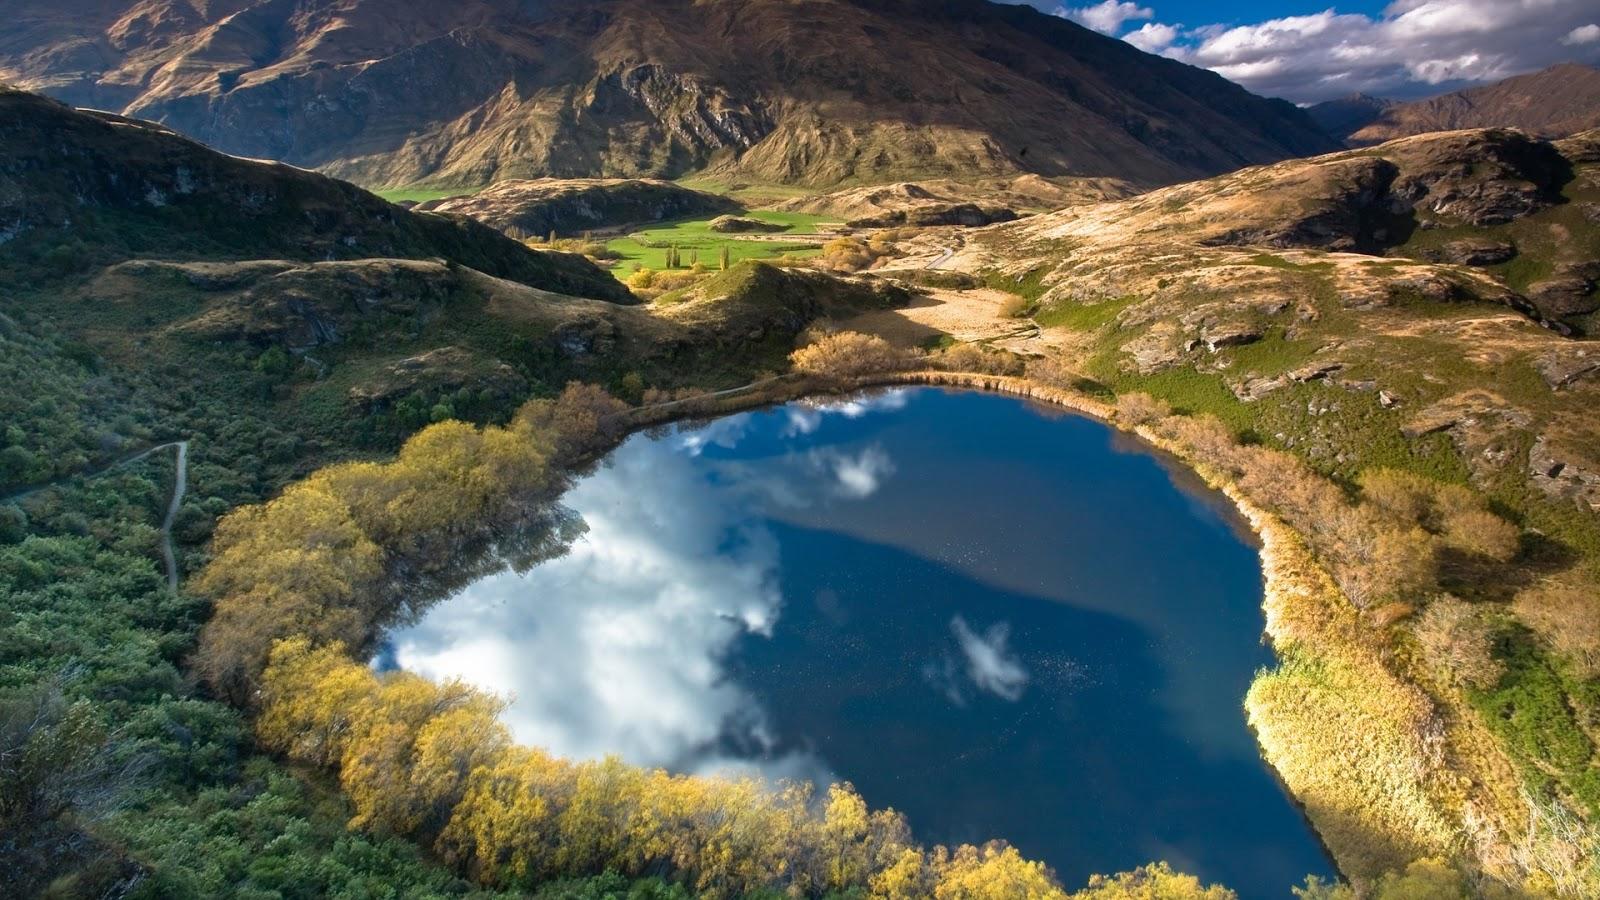 Imagenes del agua en la naturaleza imagen estanque azul for Estanque de agua